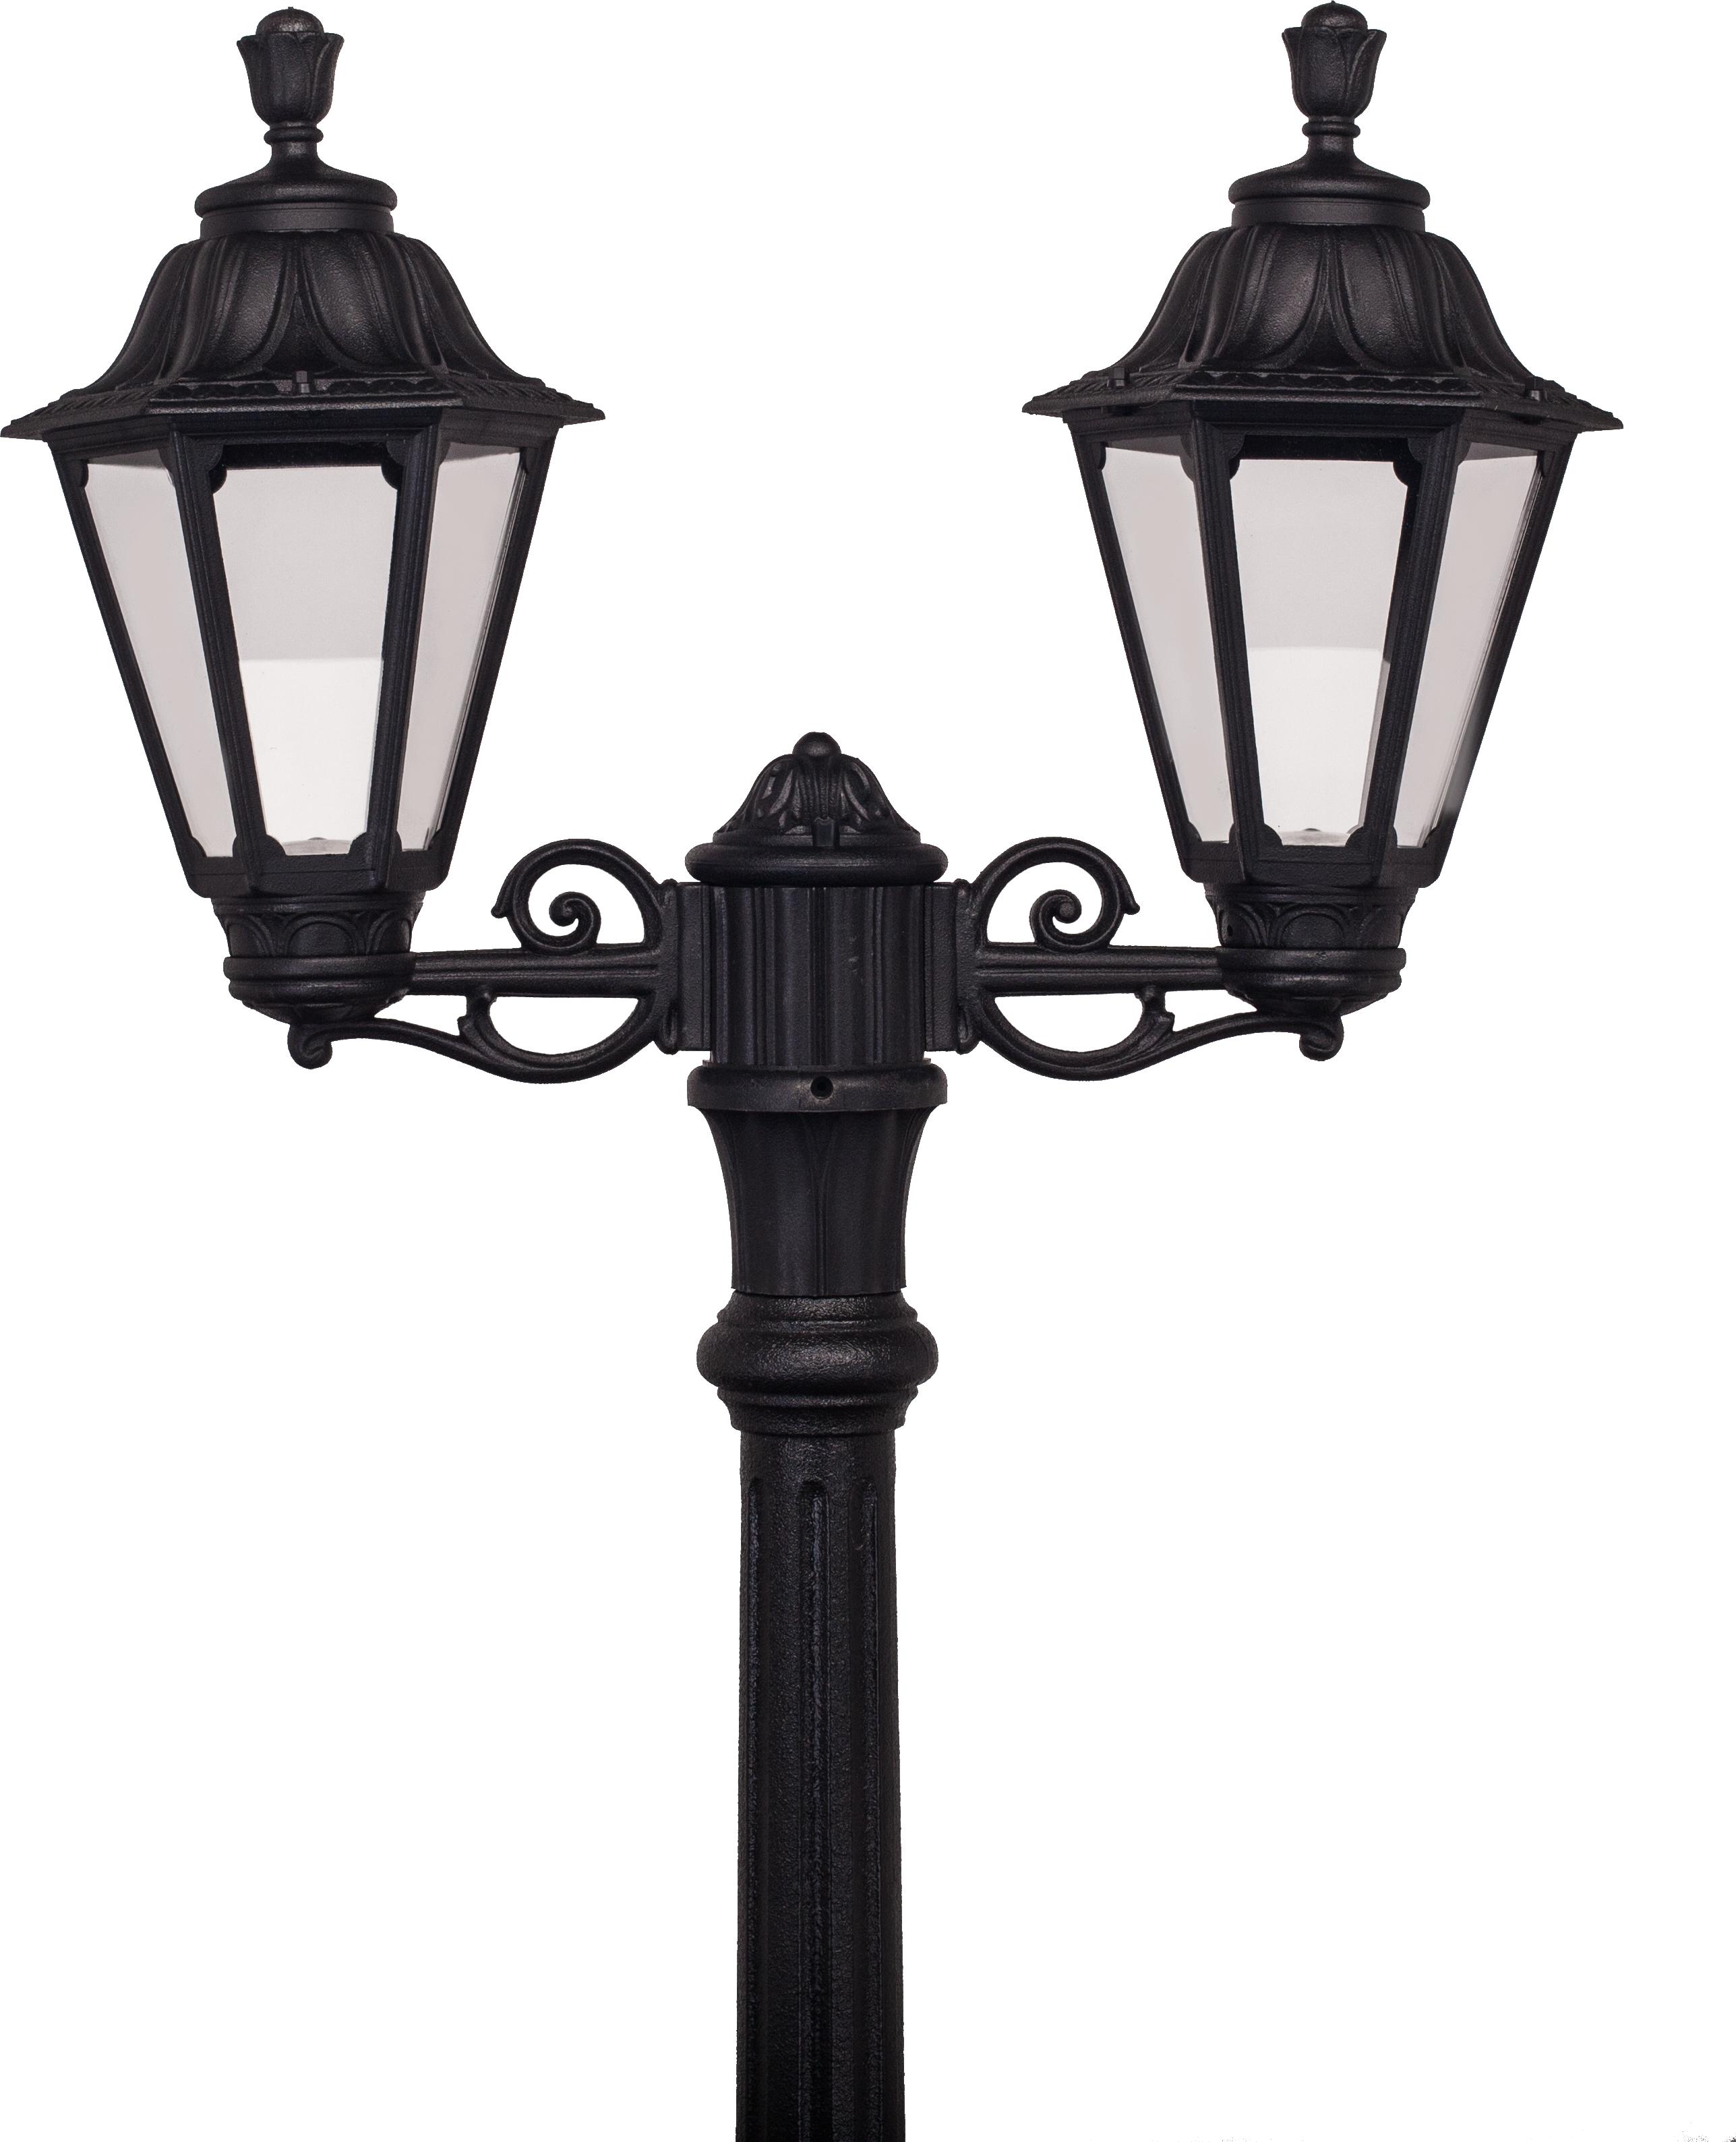 Electric png stunning baytown. Lamp clipart streetlight